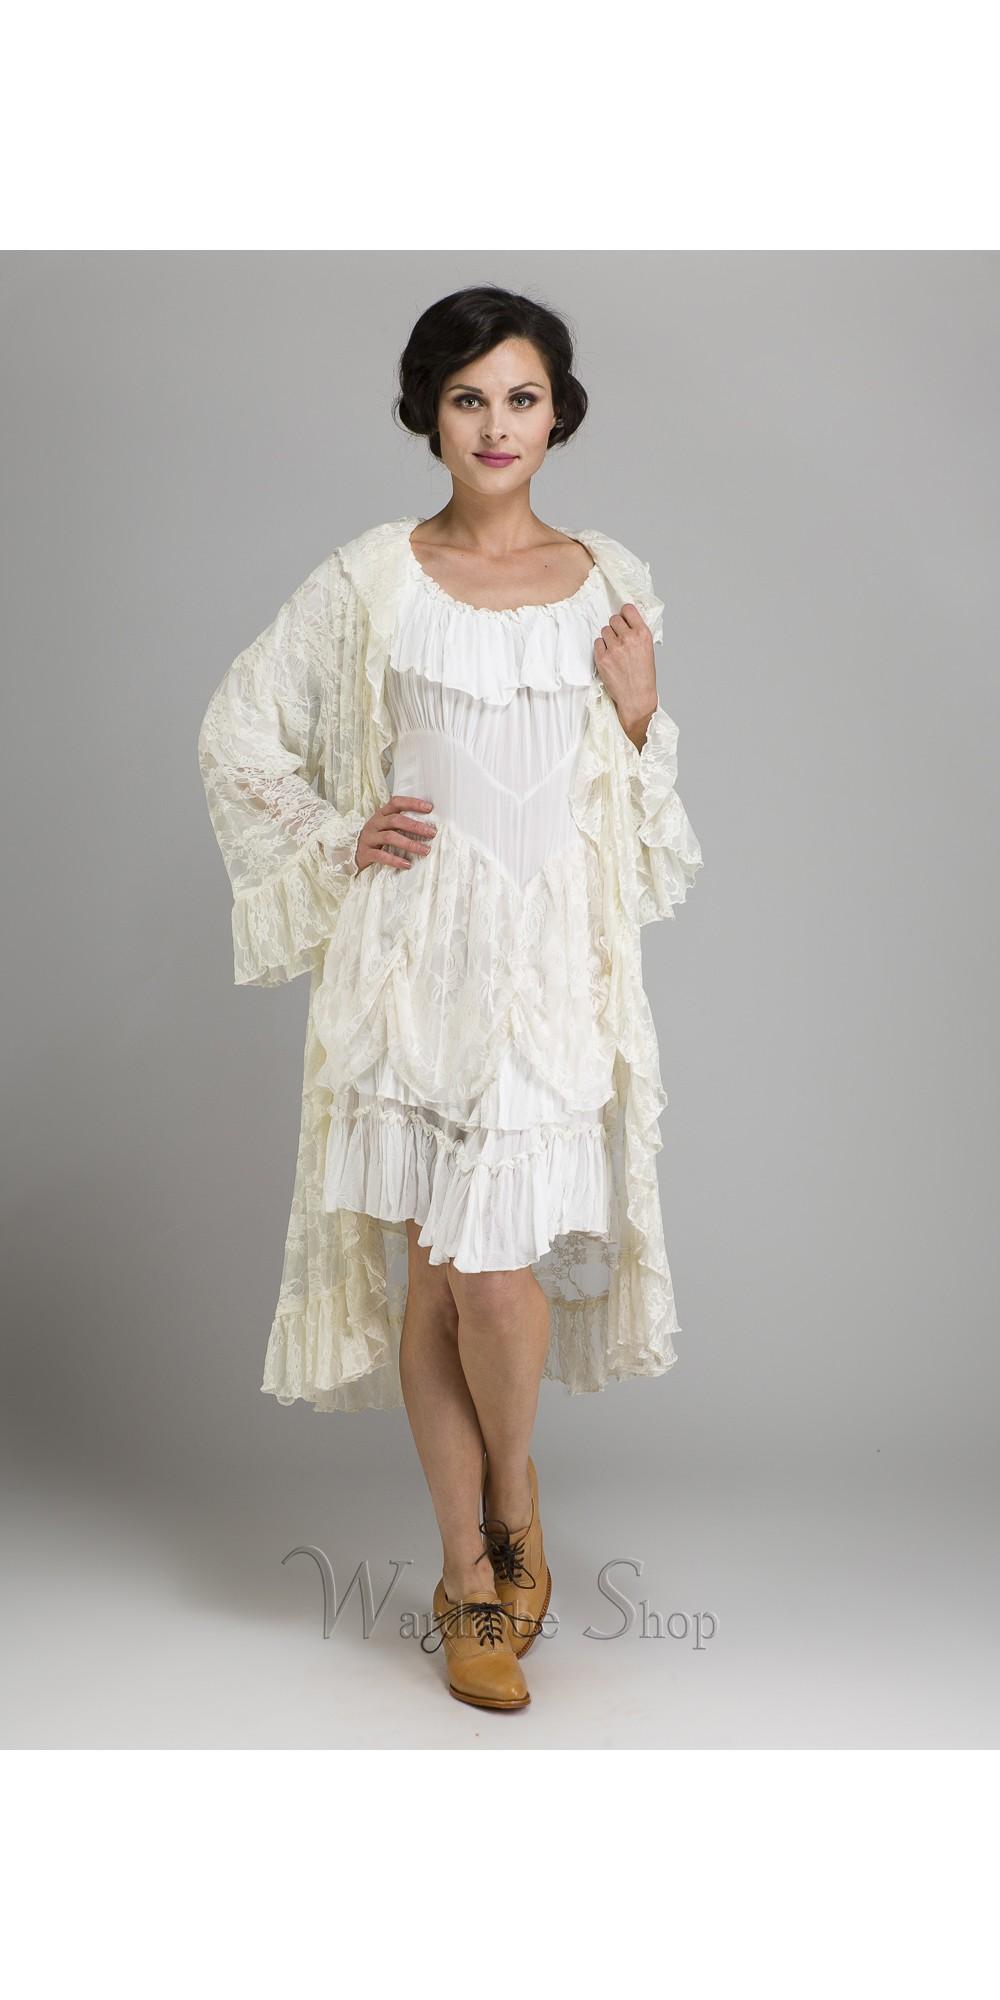 55831f11126 Western Style Romanza Jacket in White by Marrika Nakk